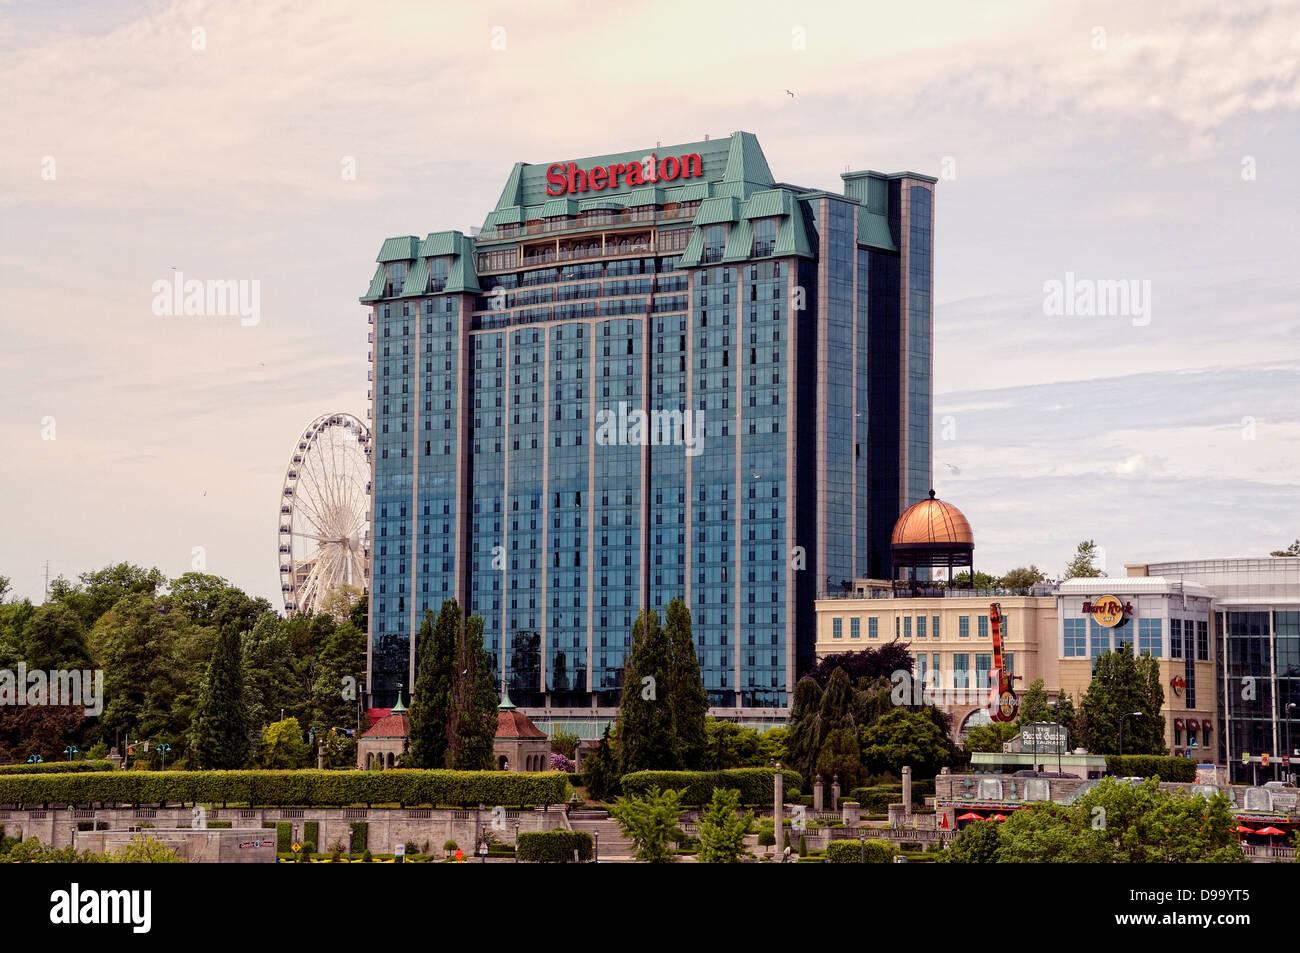 Sheraton Hotel Niagara Falls Canada